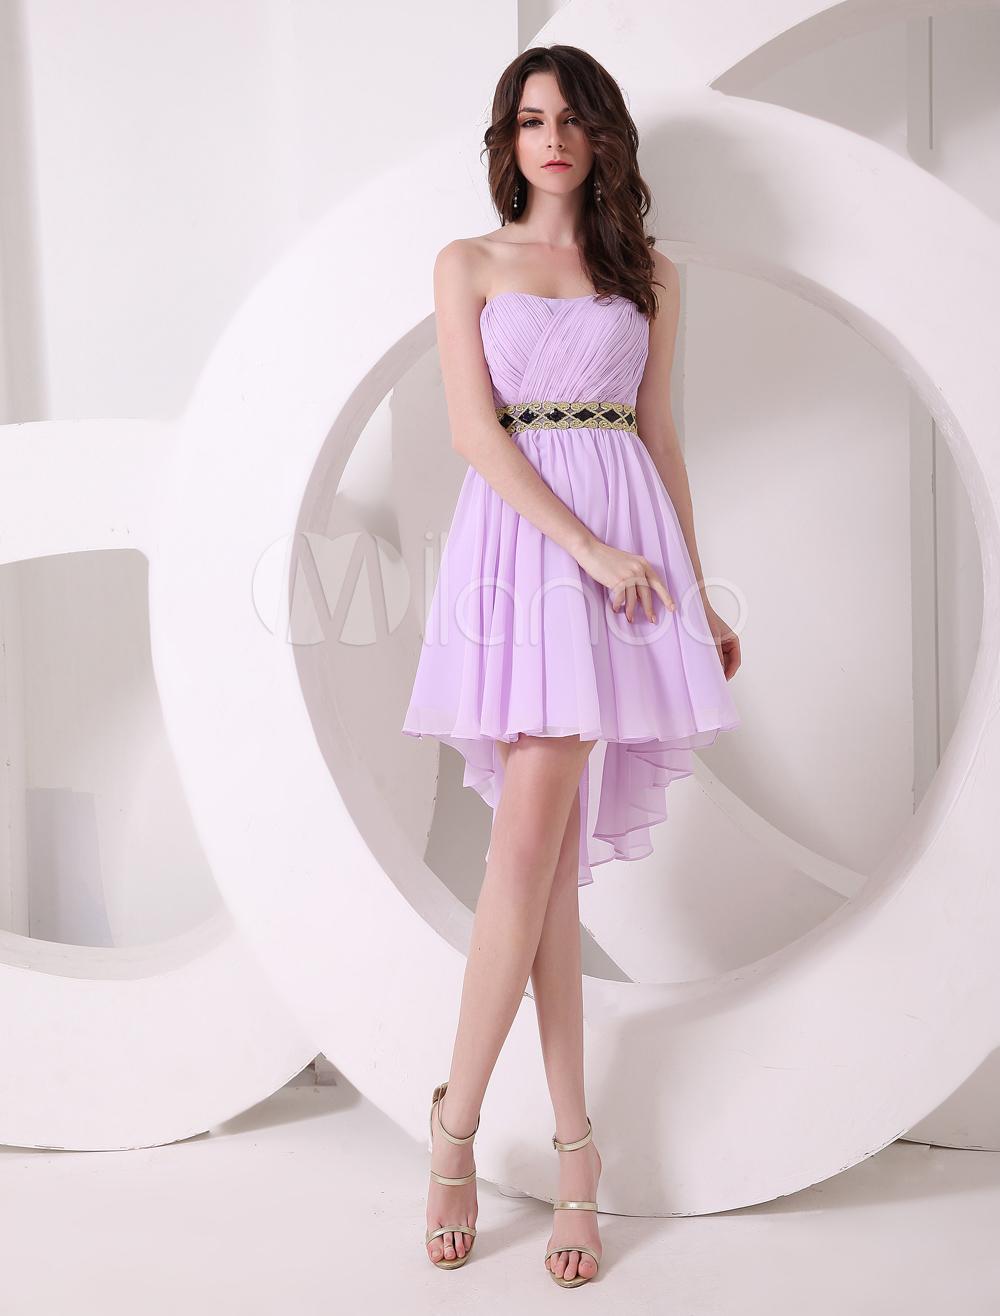 8d2fbb402 Vestido de cóctel de gasa de color lila con escote de corazón de estilo  dulce - Milanoo.com